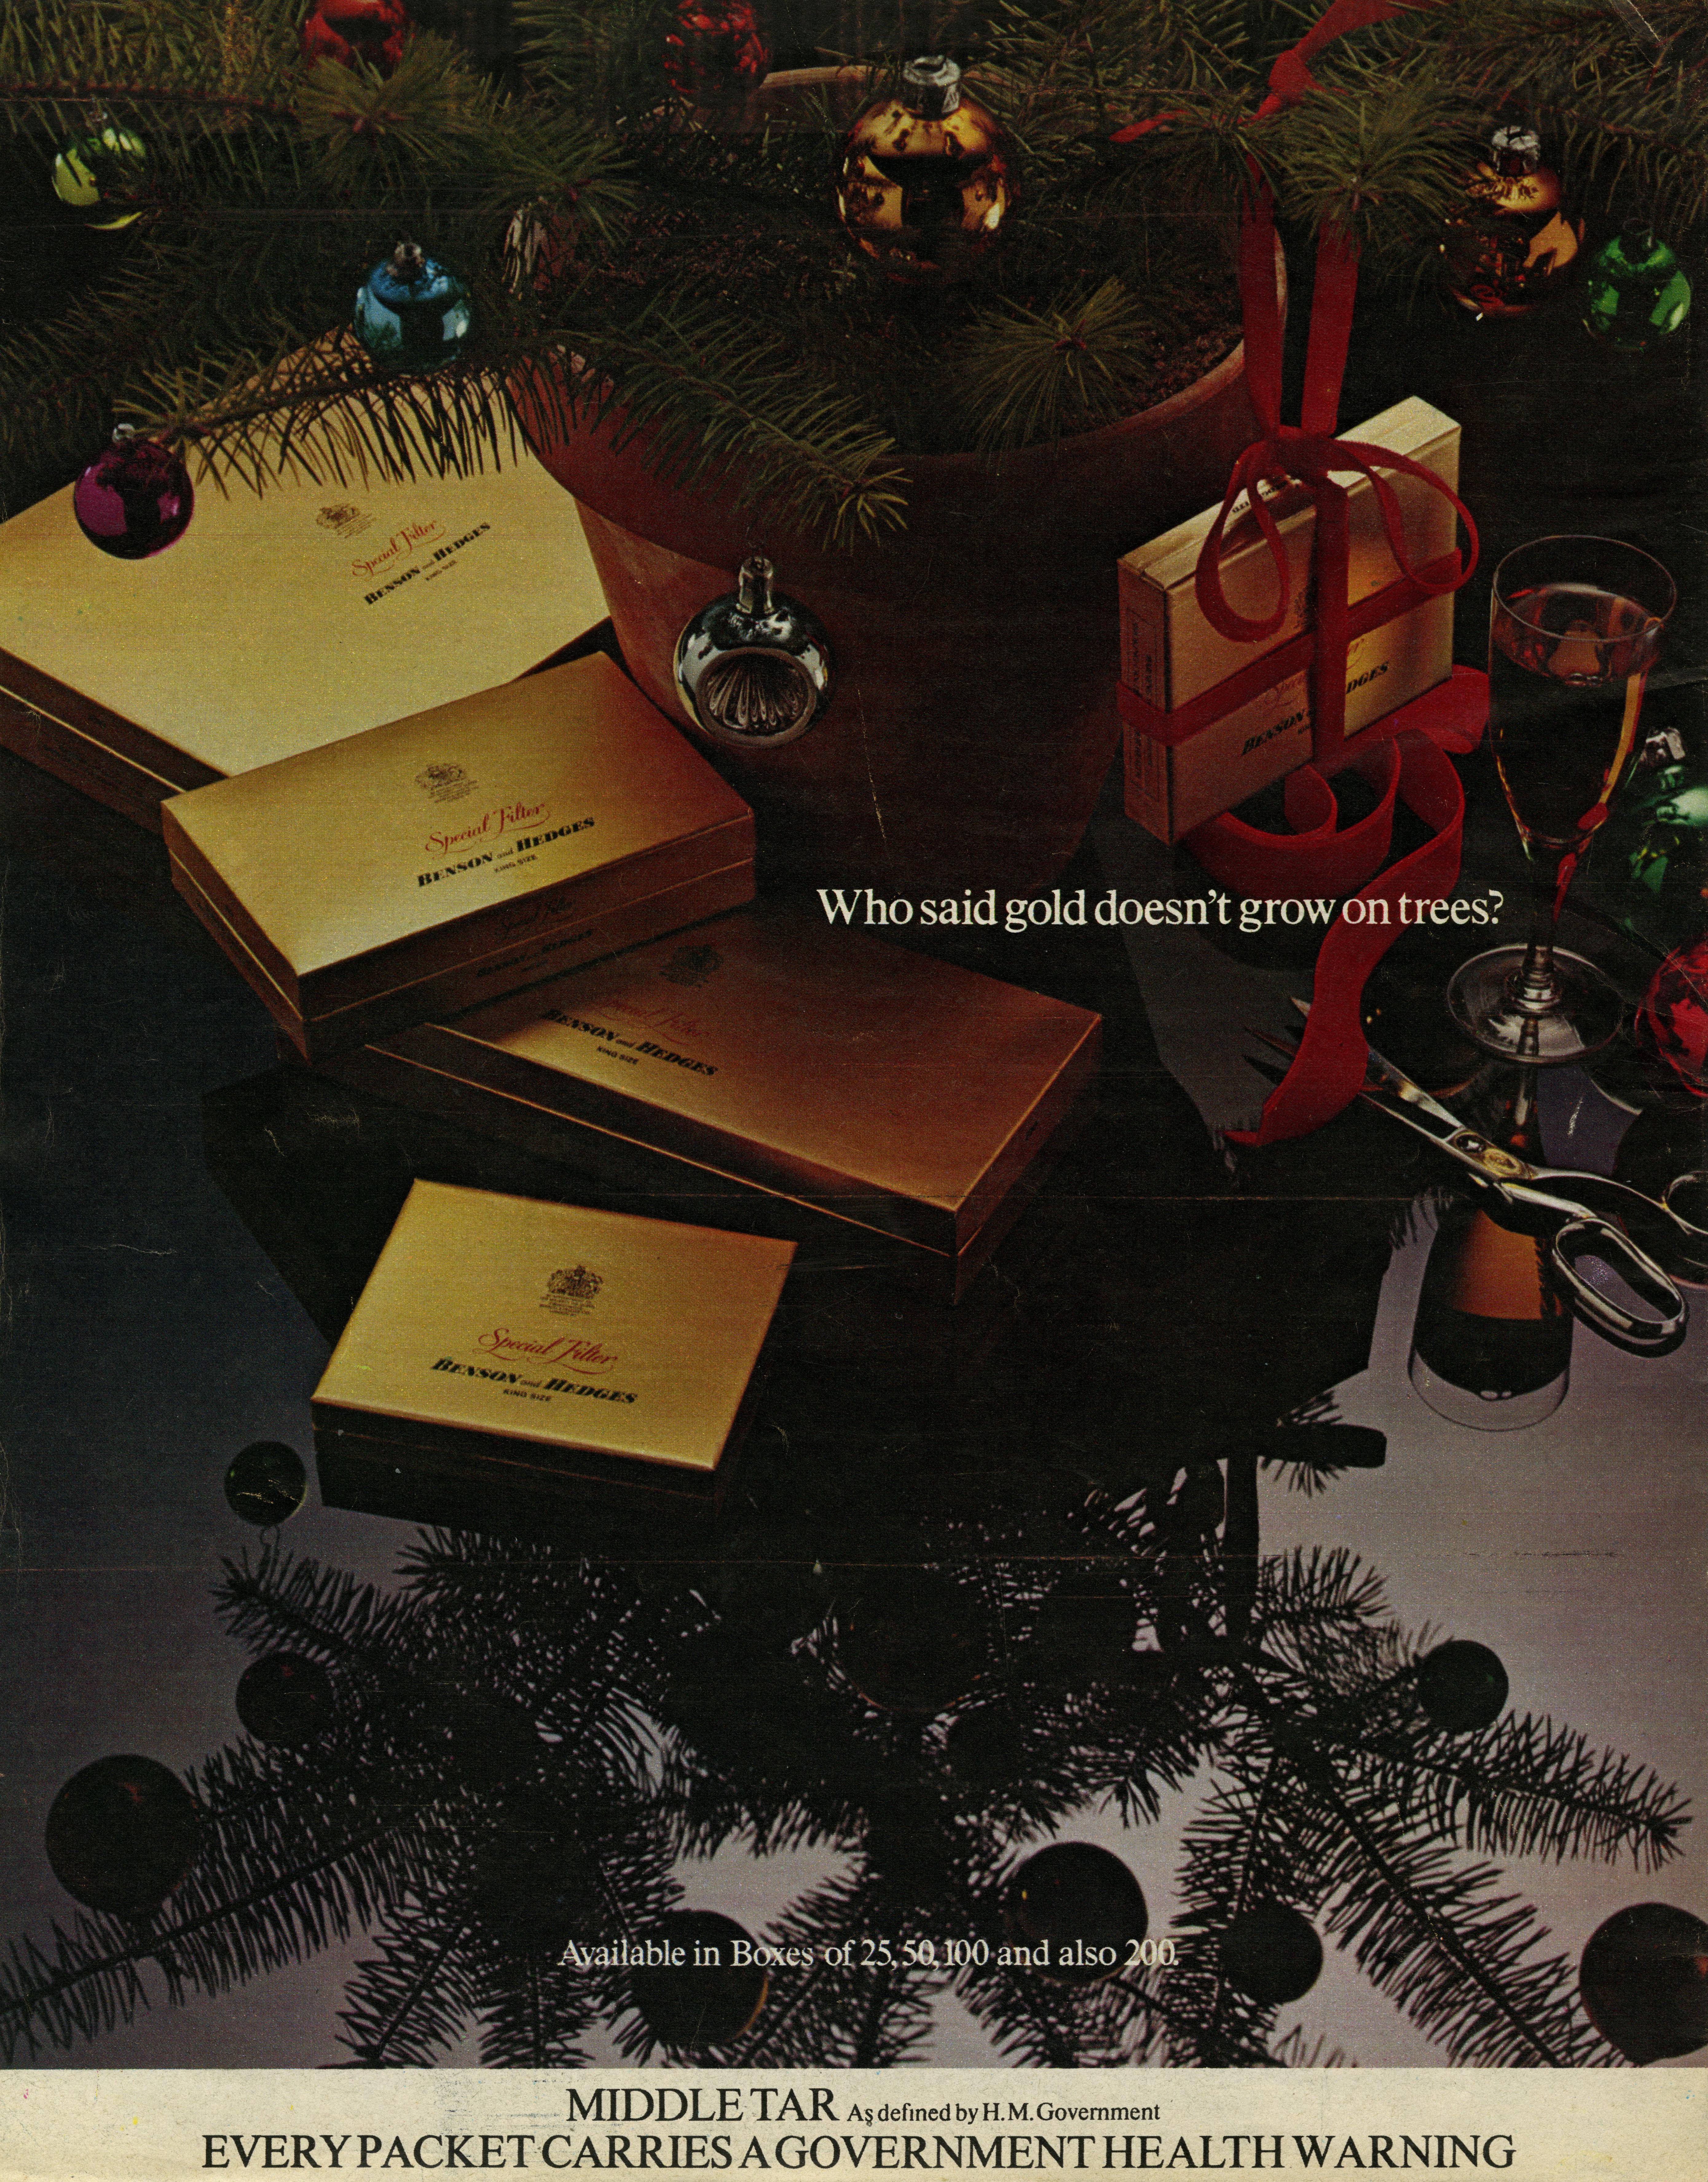 B&H Gold Box - 'Grow ON Trees', CDP-01